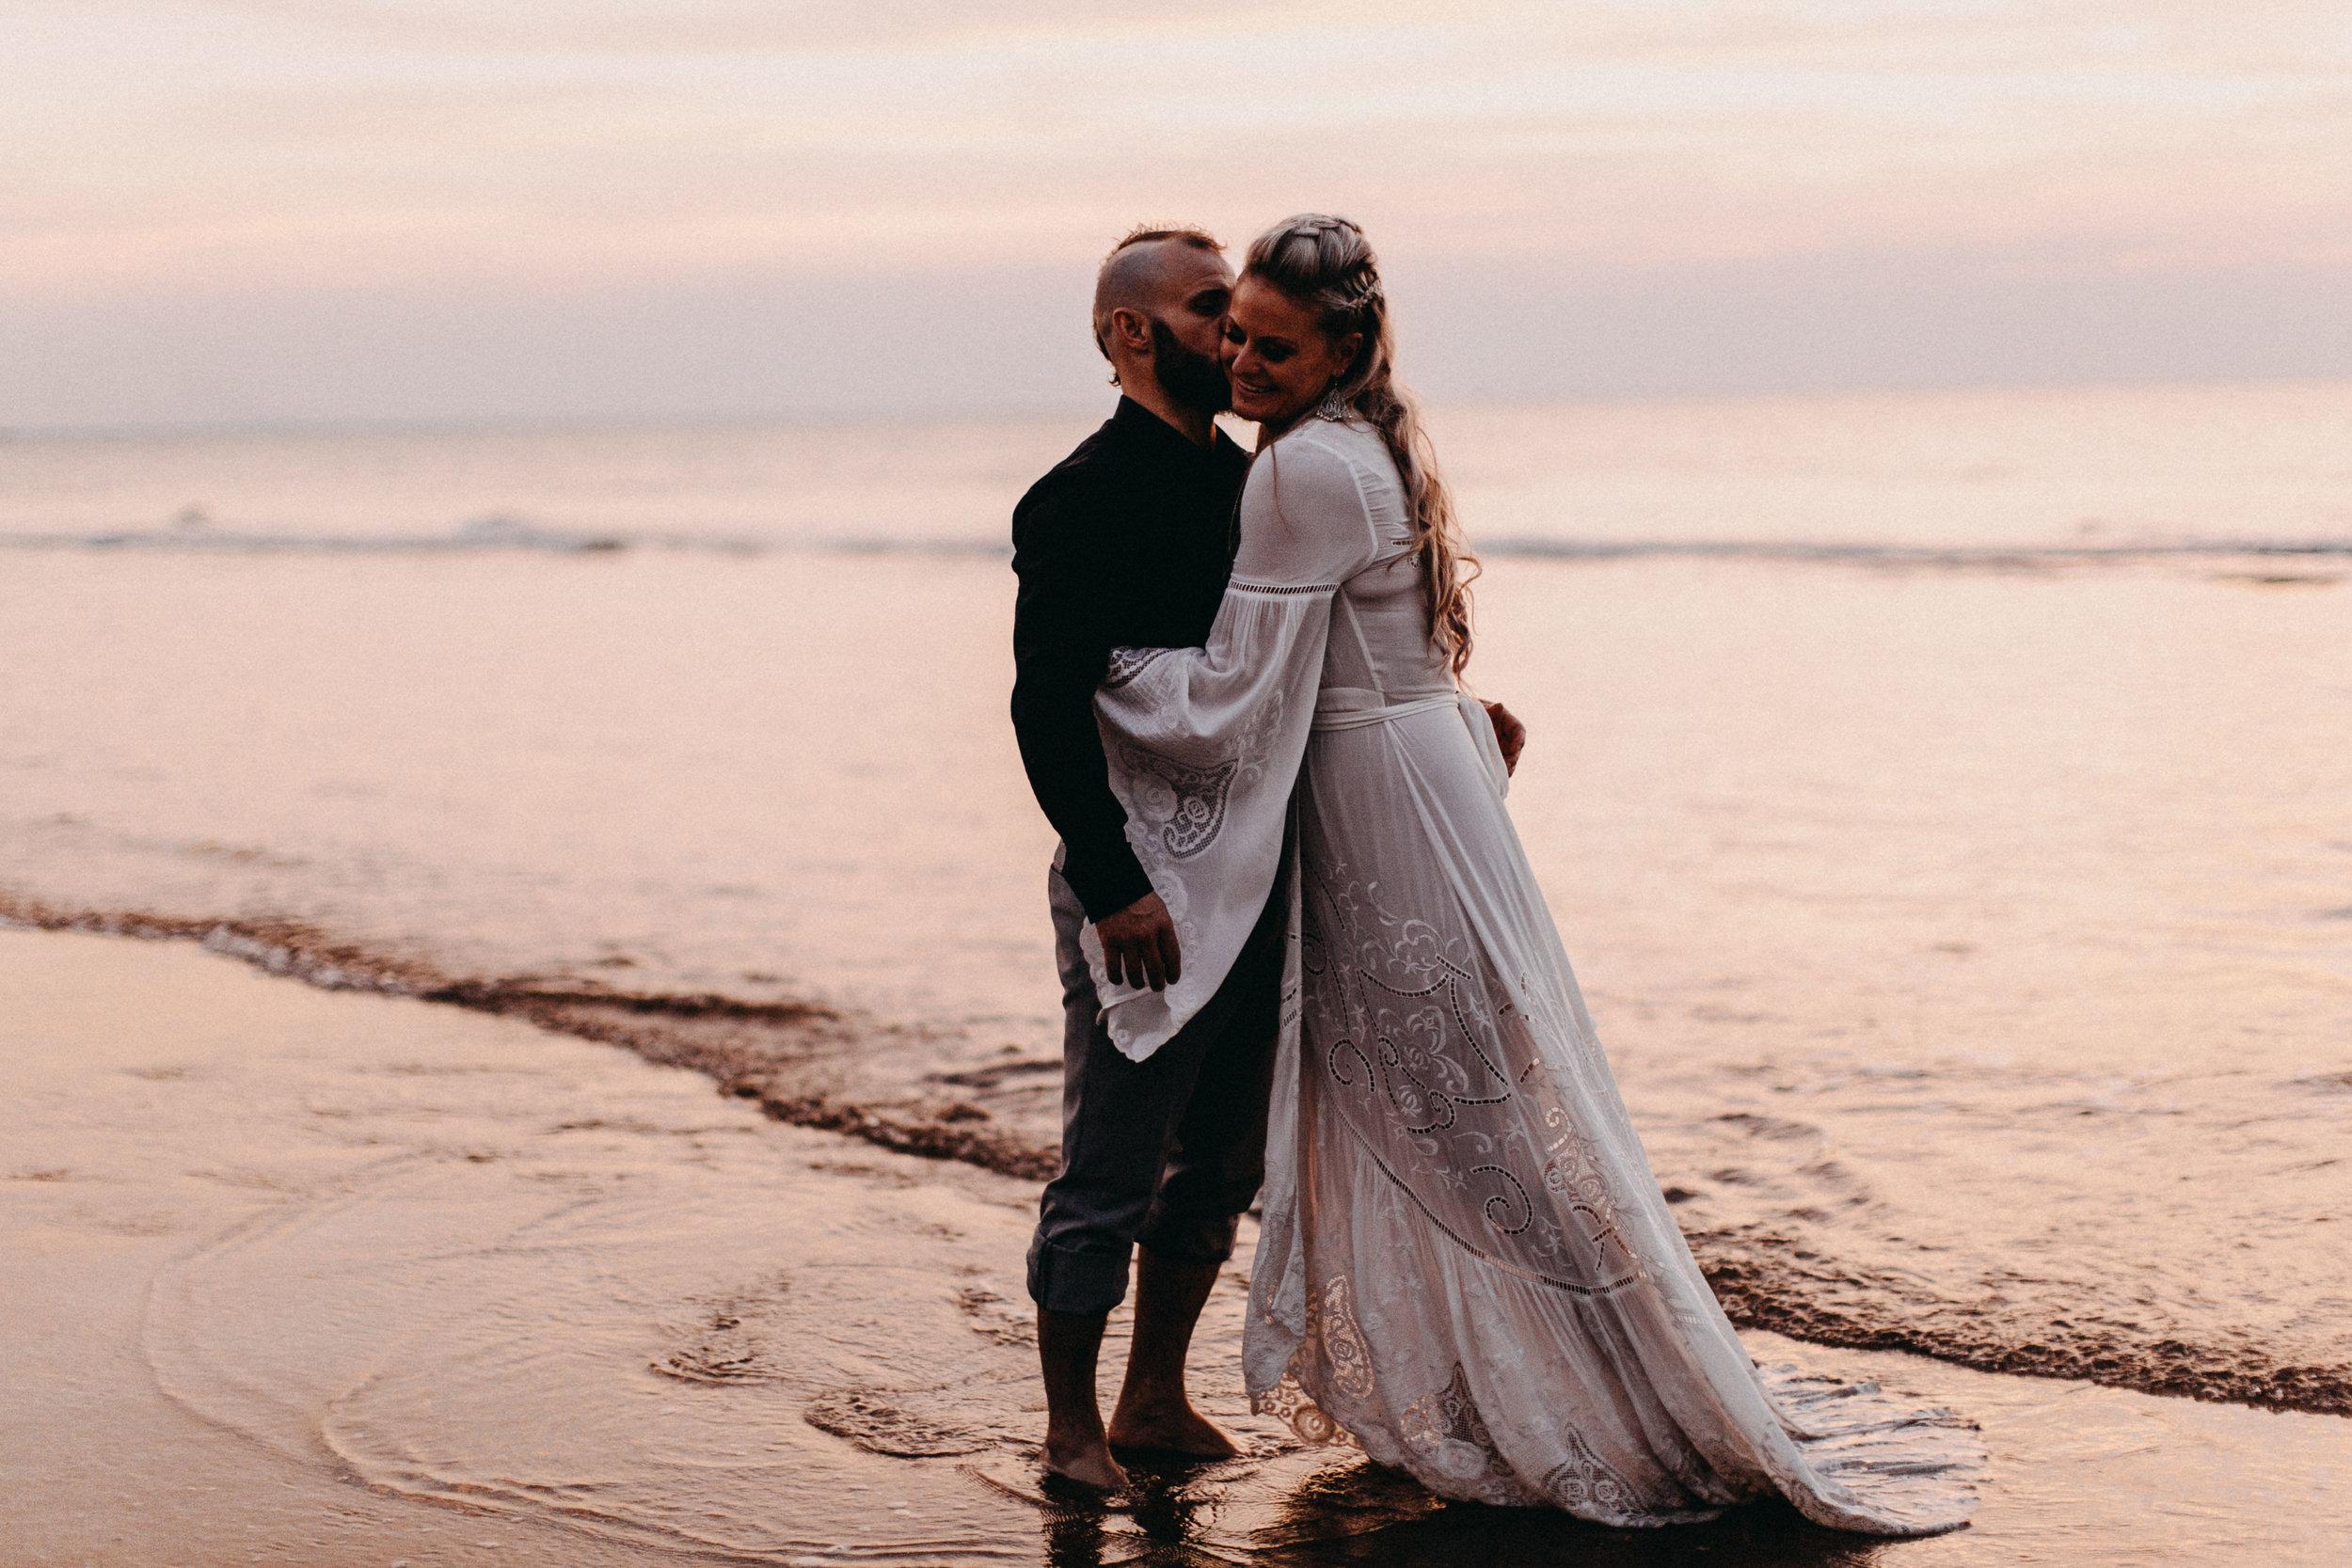 darwin-elopement-wedding-beach-camden-photography-www.emilyobrienphotography.net-102.jpg